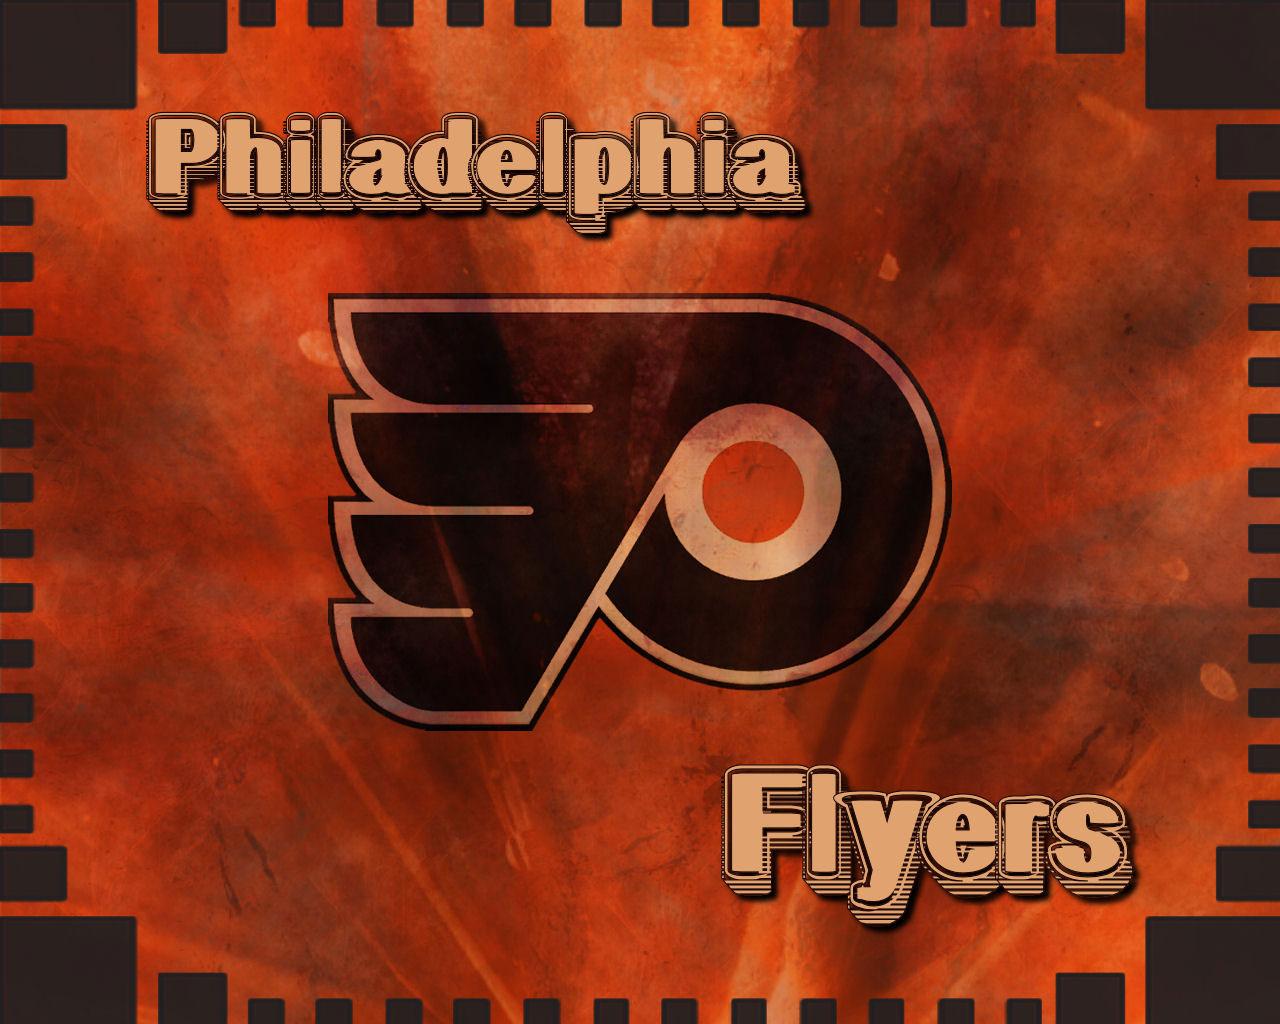 NHL Wallpapers   Philadelphia Flyers wallpaper 1280x1024